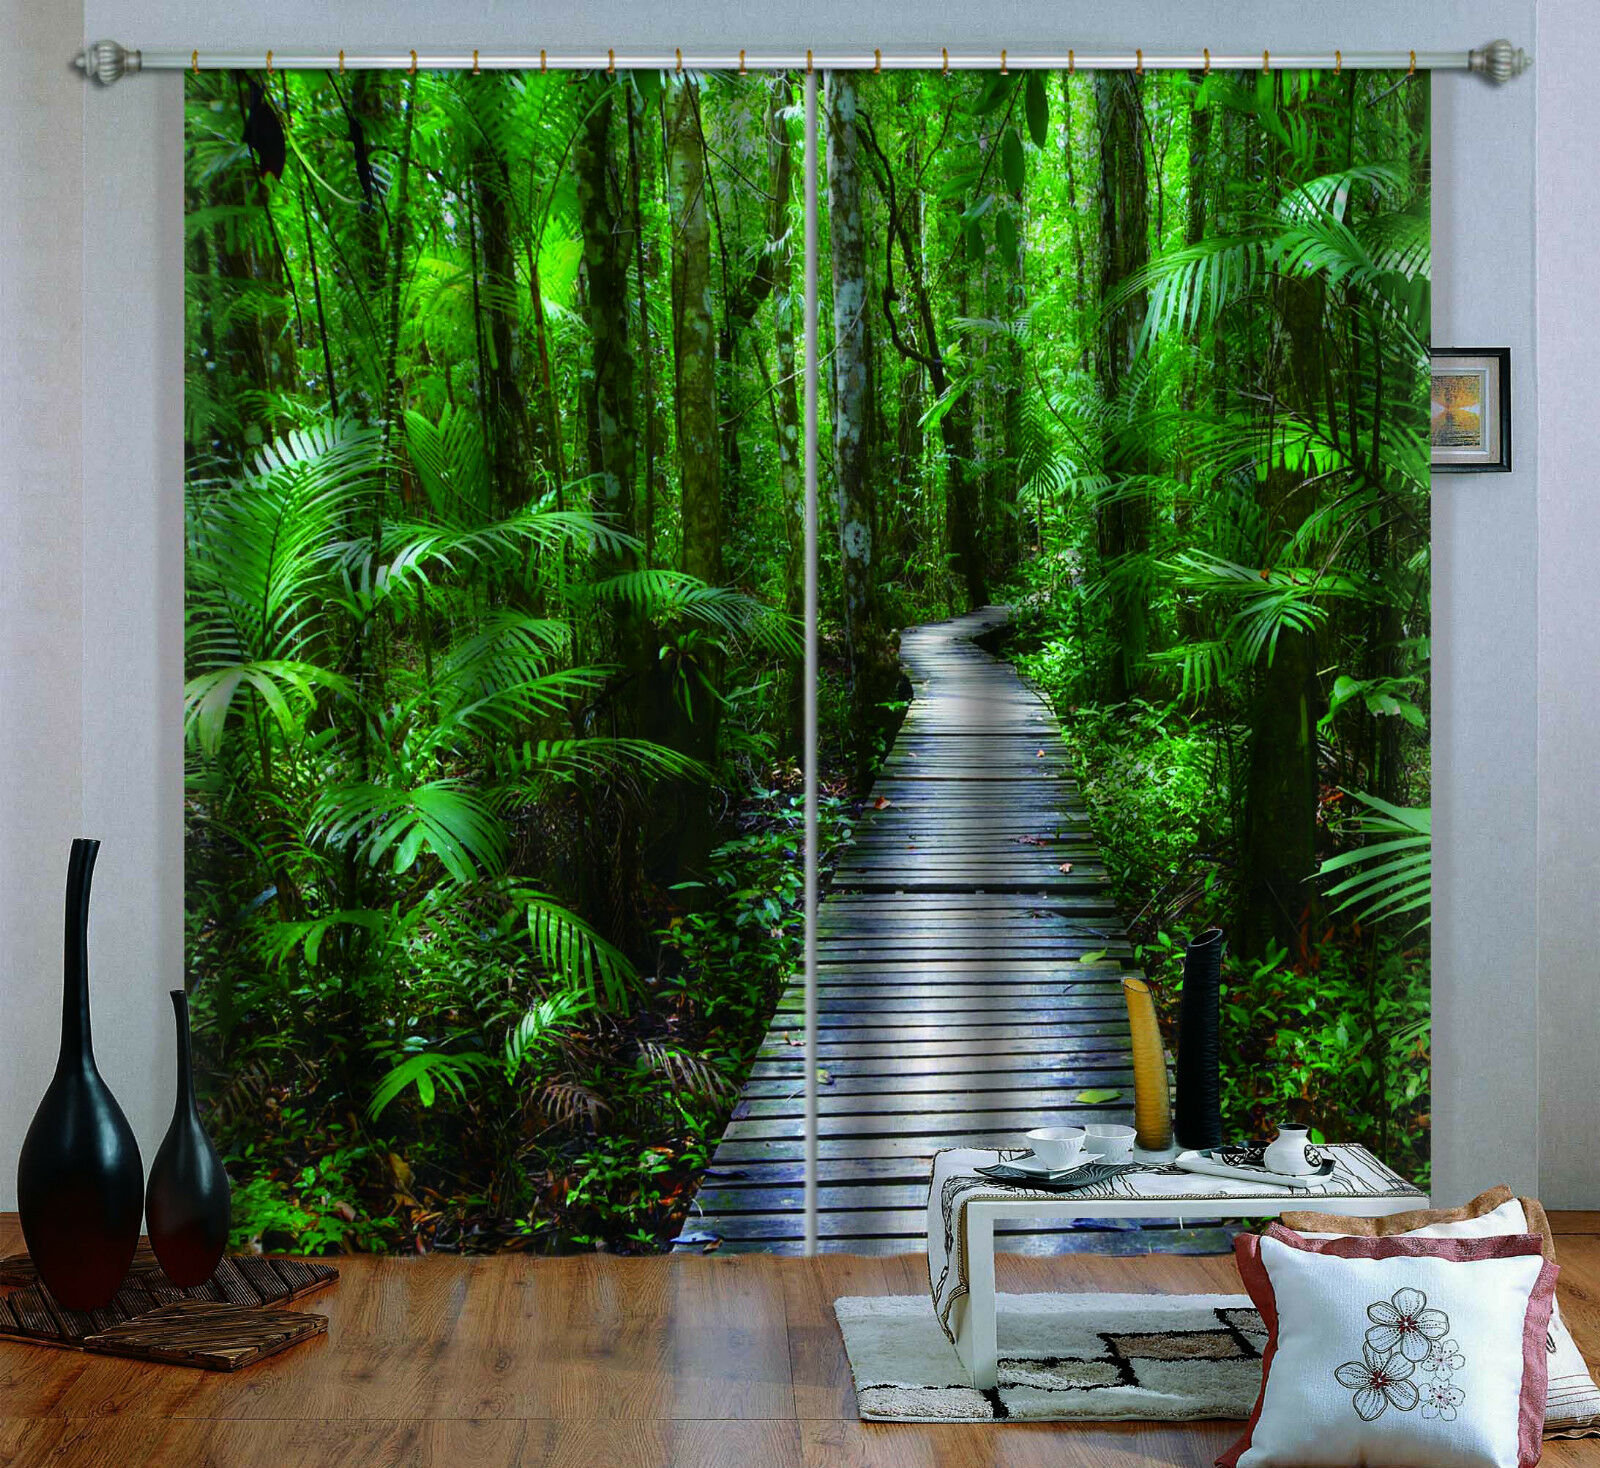 3d Forest Path 25 bloqueo foto cortina cortina de impresión sustancia cortinas de ventana